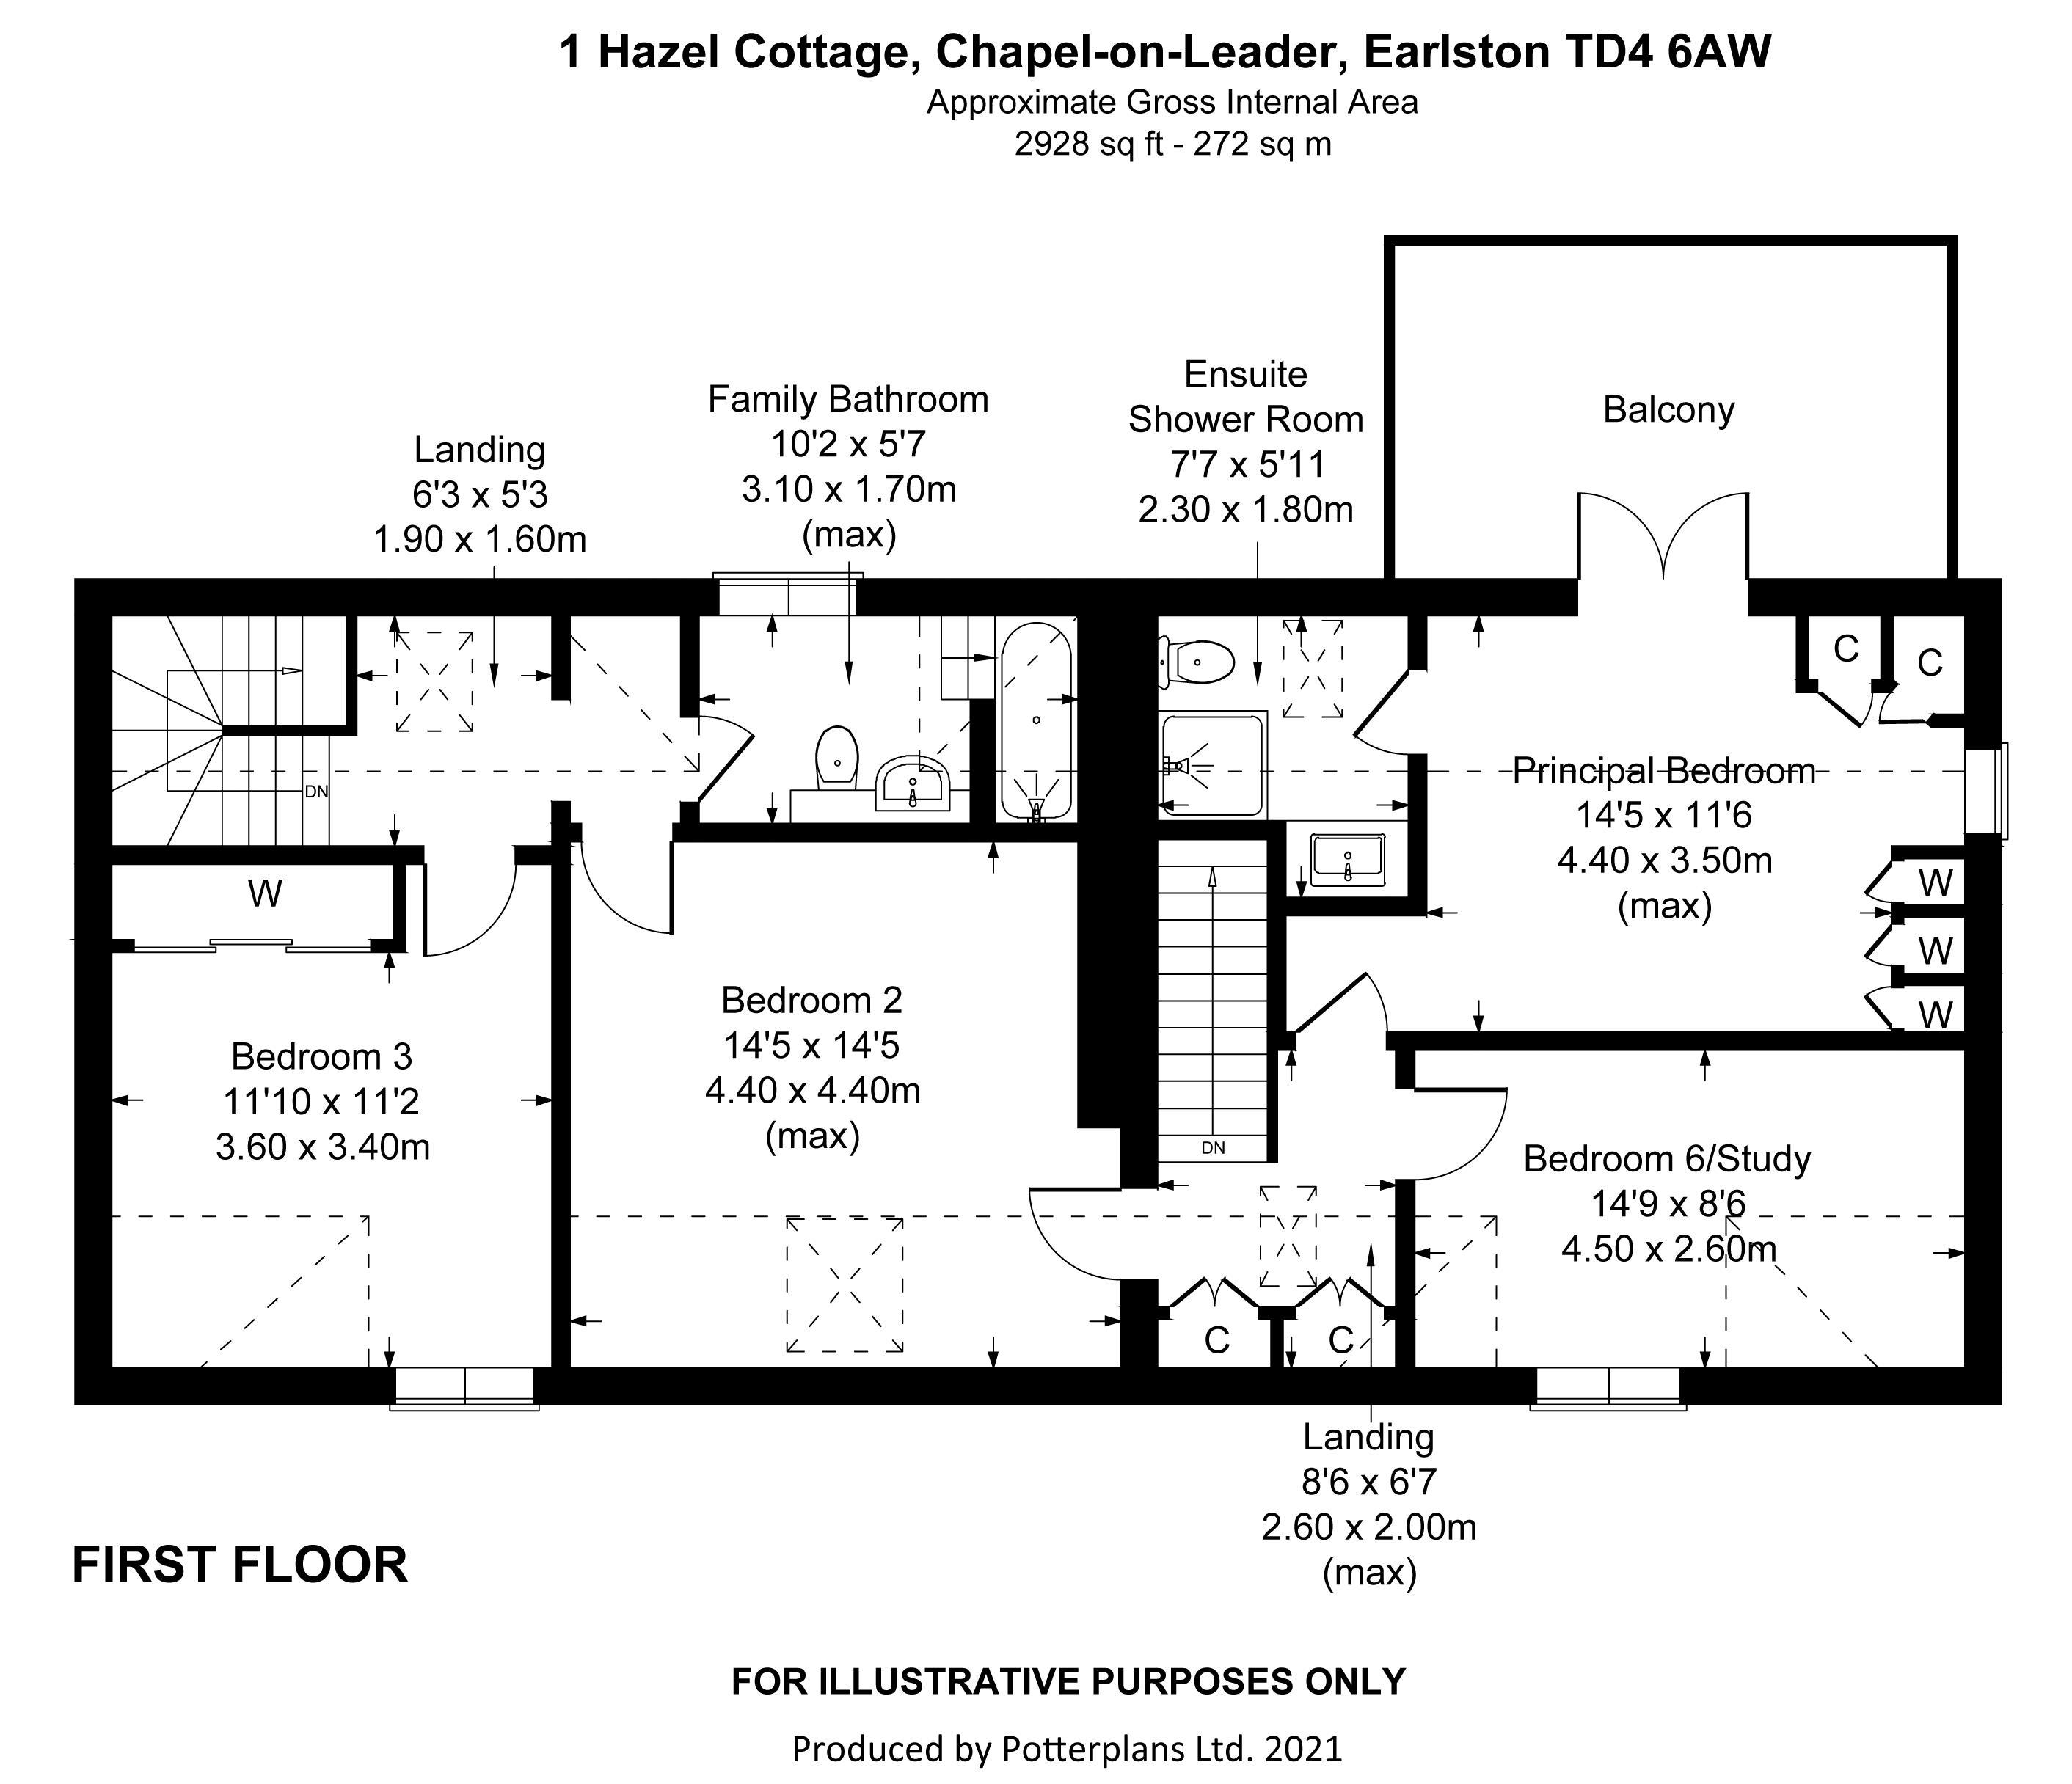 1 Hazel Cottage First Floor